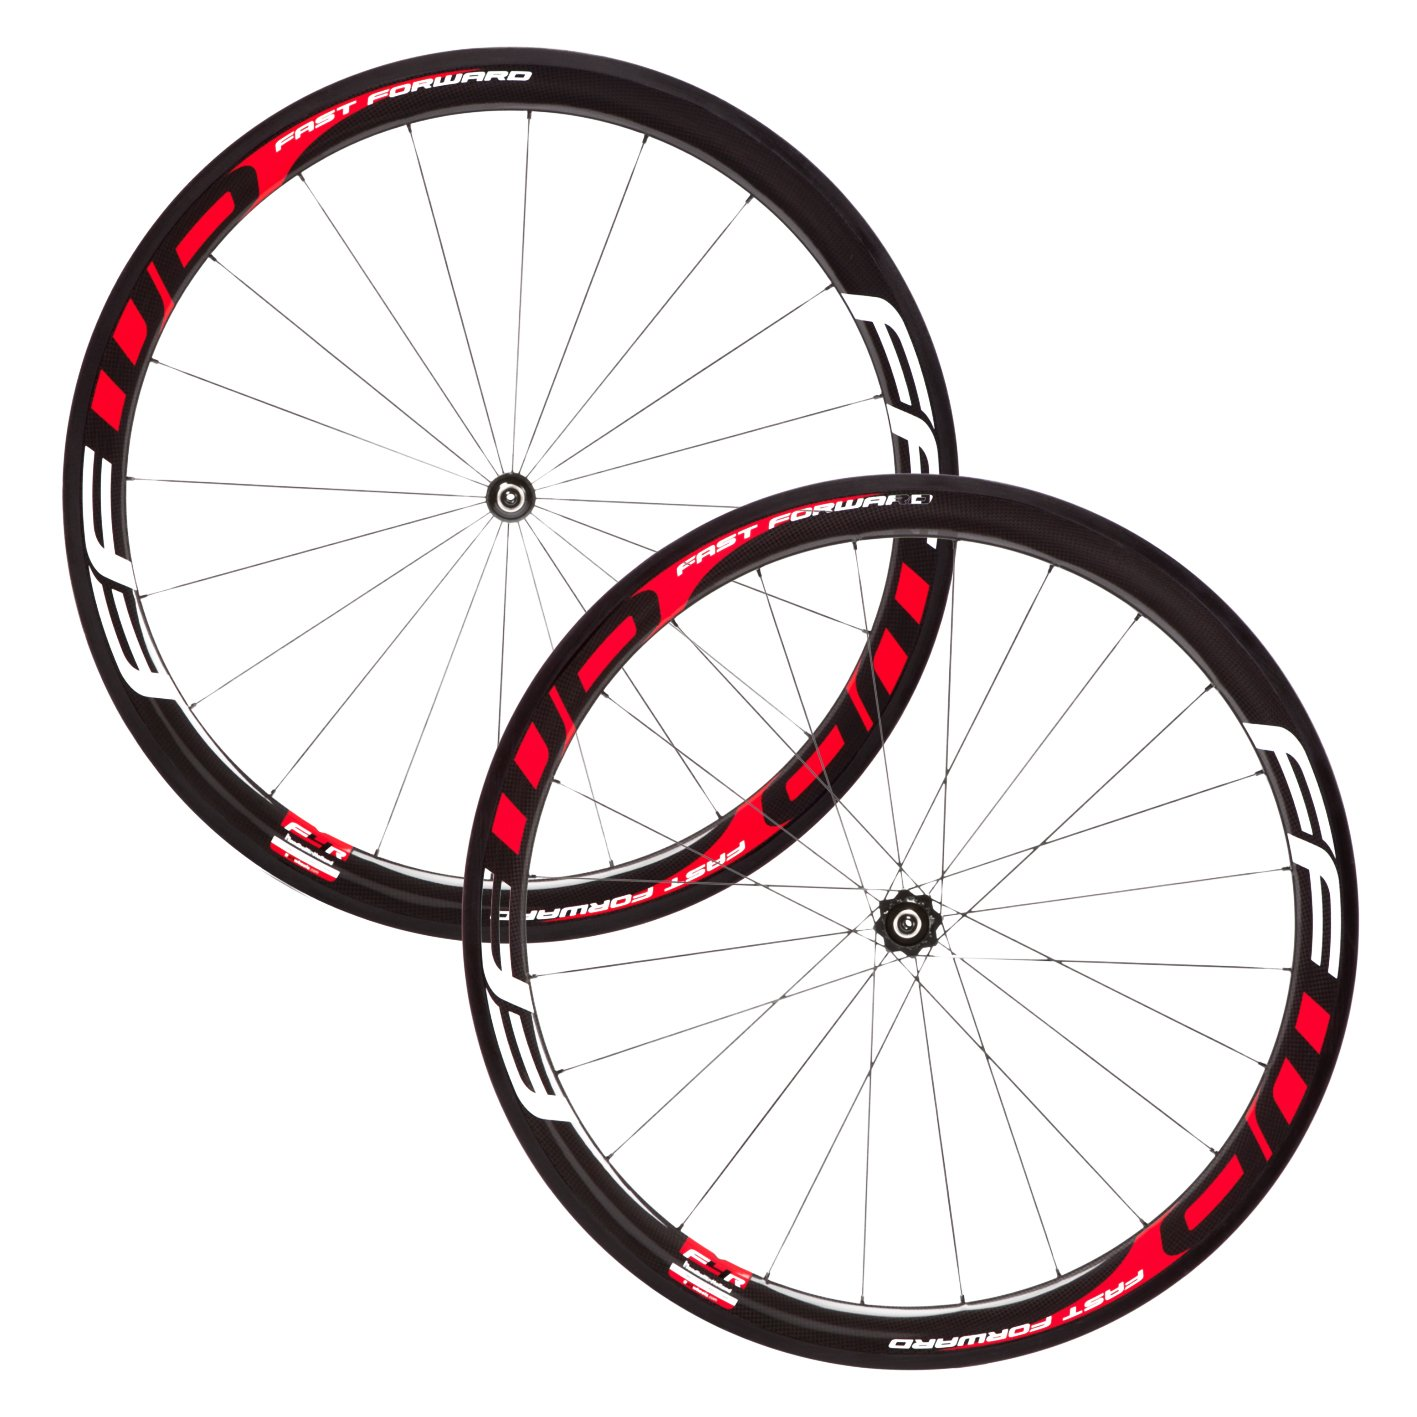 FFWD(ファストフォワード) F4R(45mm) FCC DT180 Carbon Ceramic Hub Clincher(クリンチャー ) Wheelset(ホイールセット) - Red/White [Shimano/Sram 11S] [並行輸入品] B071JXFKR1